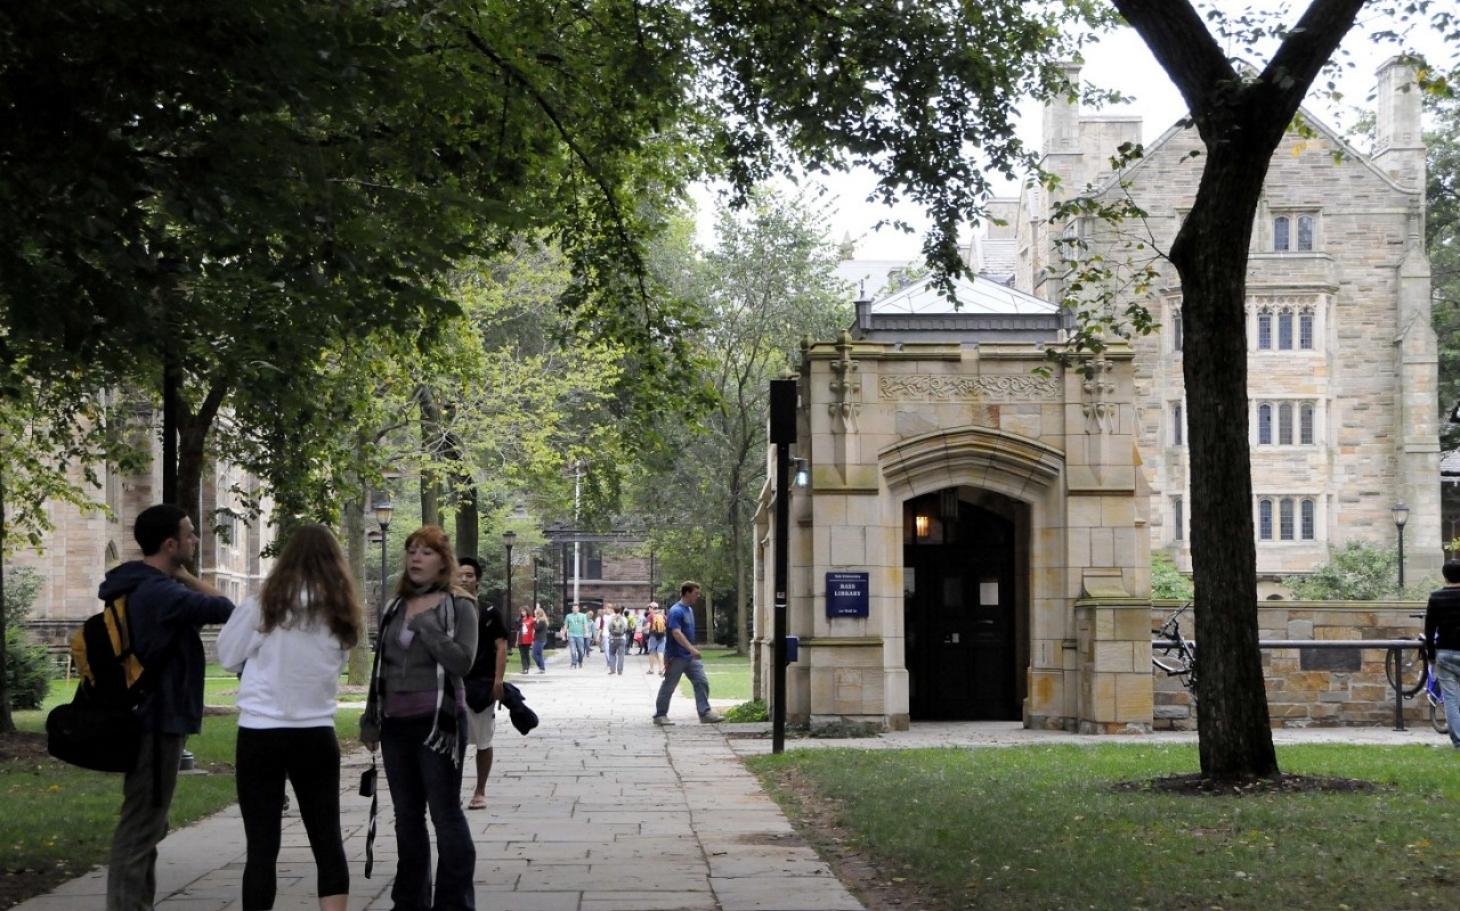 Yale Teacher Resigns Over Halloween Costume Email | Al Jazeera America